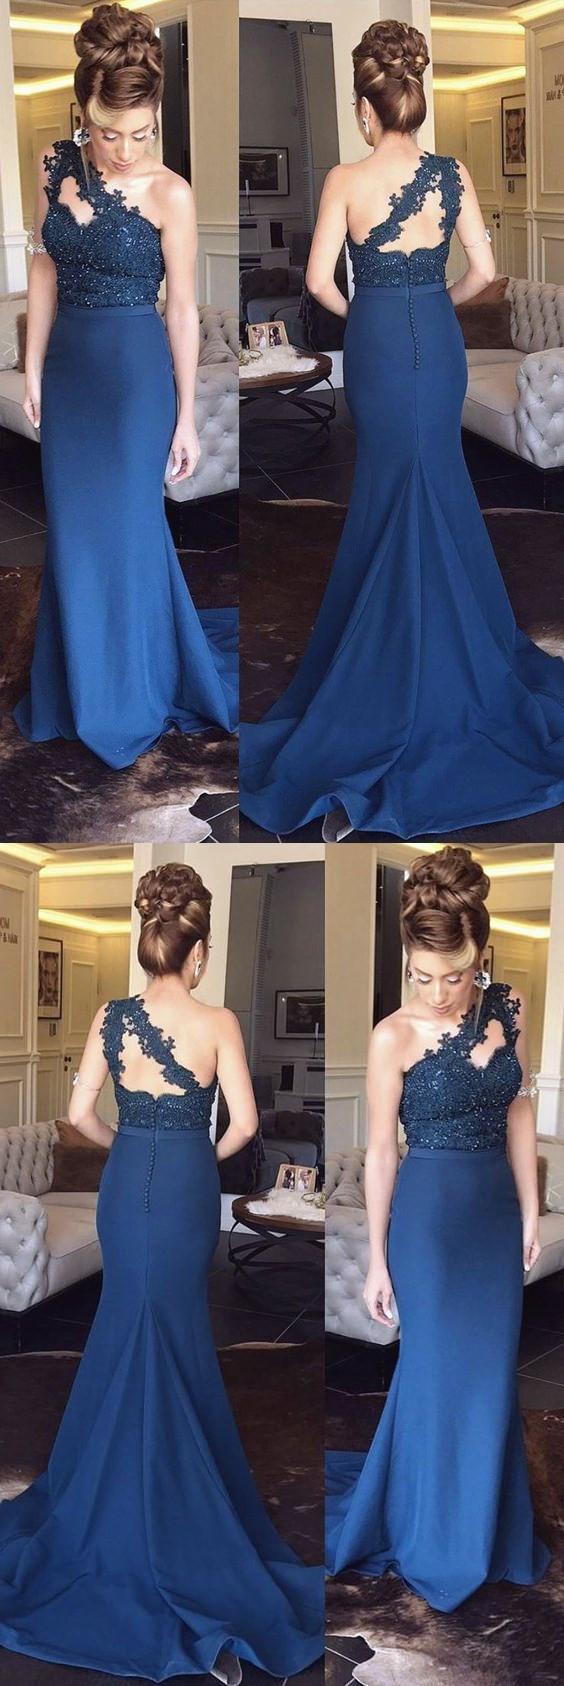 Navy Blue Lace Appliques One Shoulder Mermaid Bridesmaid Dresses